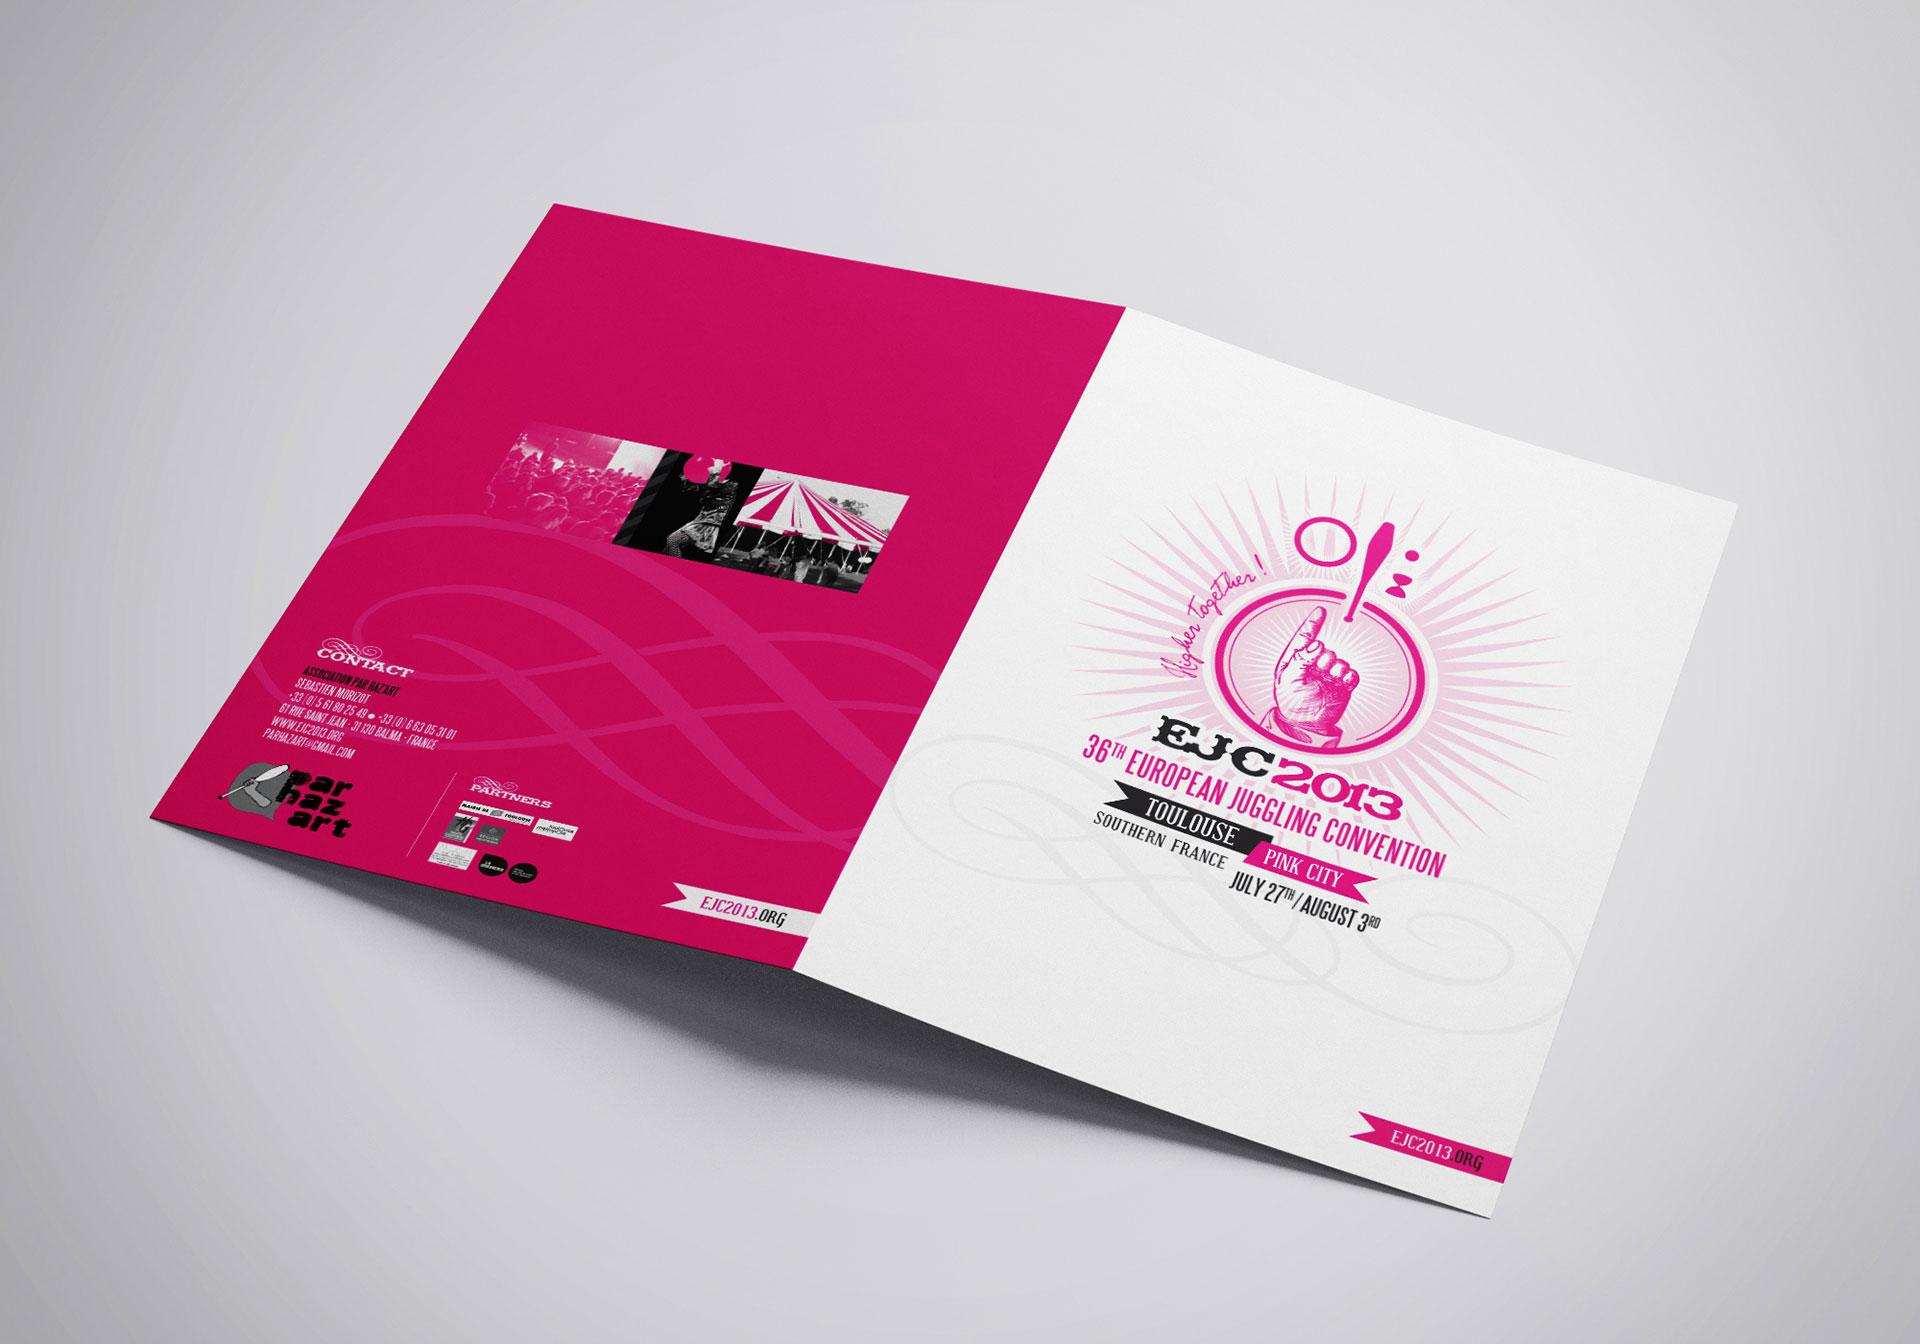 Chemise commerciale EJC2013-Cmondada Design